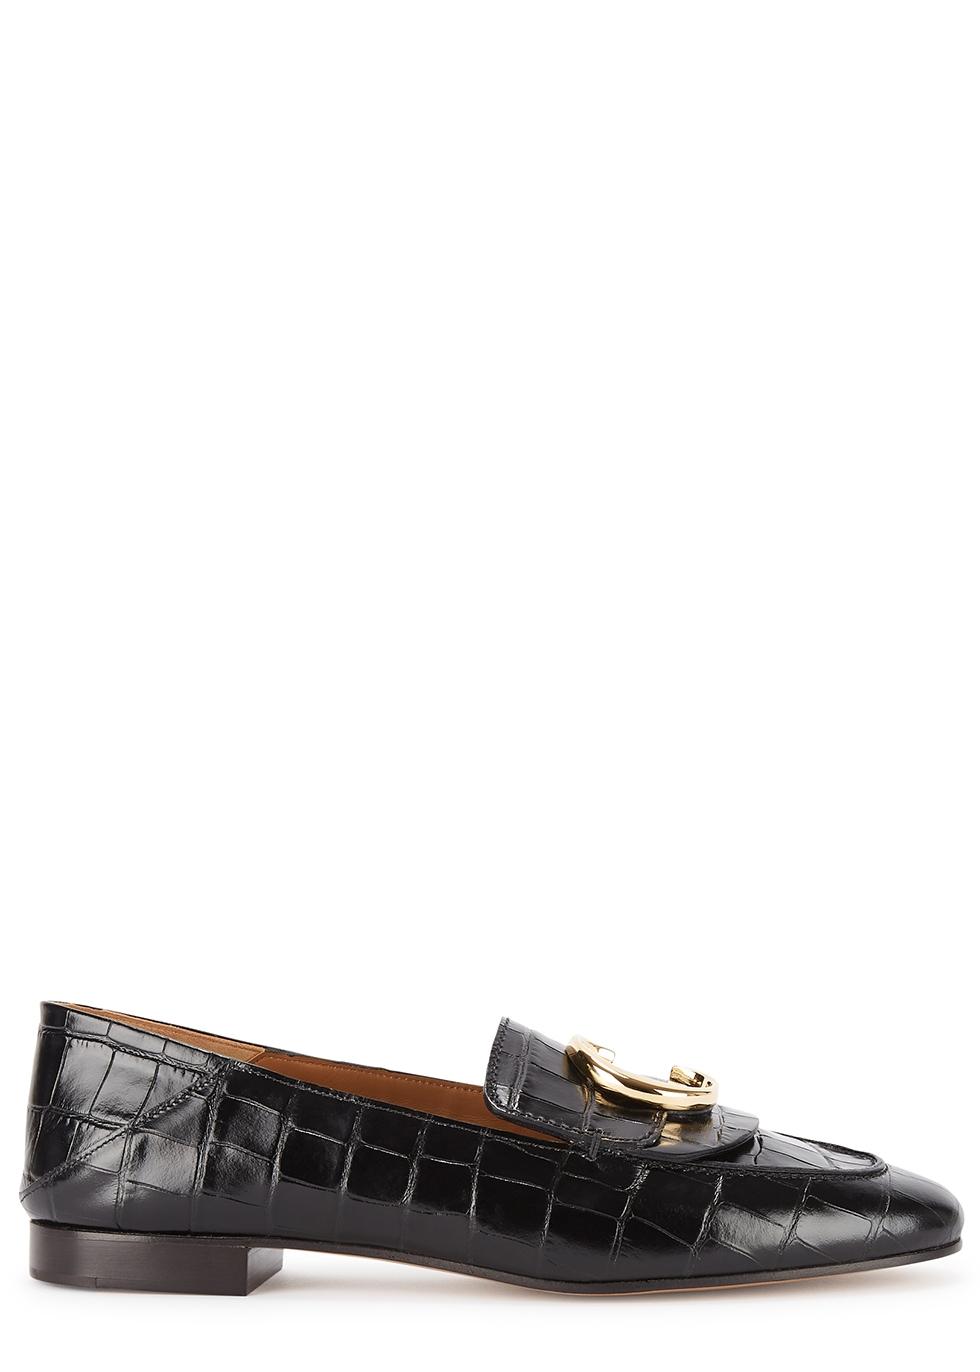 e6531e8f06822 Women's Designer Flats - Flat Shoes - Harvey Nichols